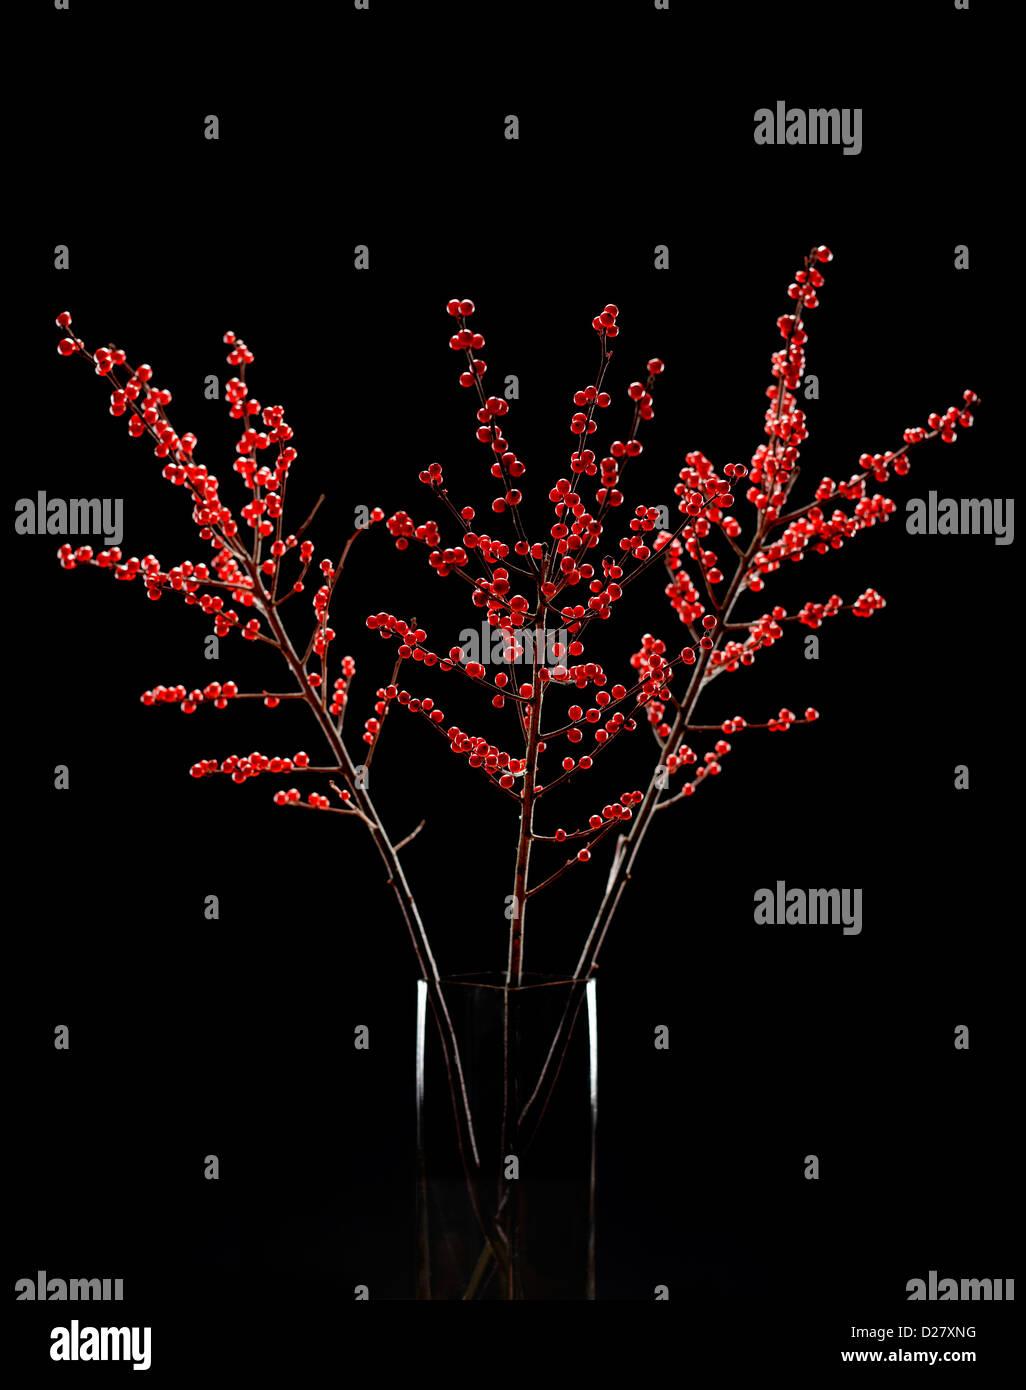 Arrangement of Red Winter Berries in Glass Vase on Black Background - Stock Image